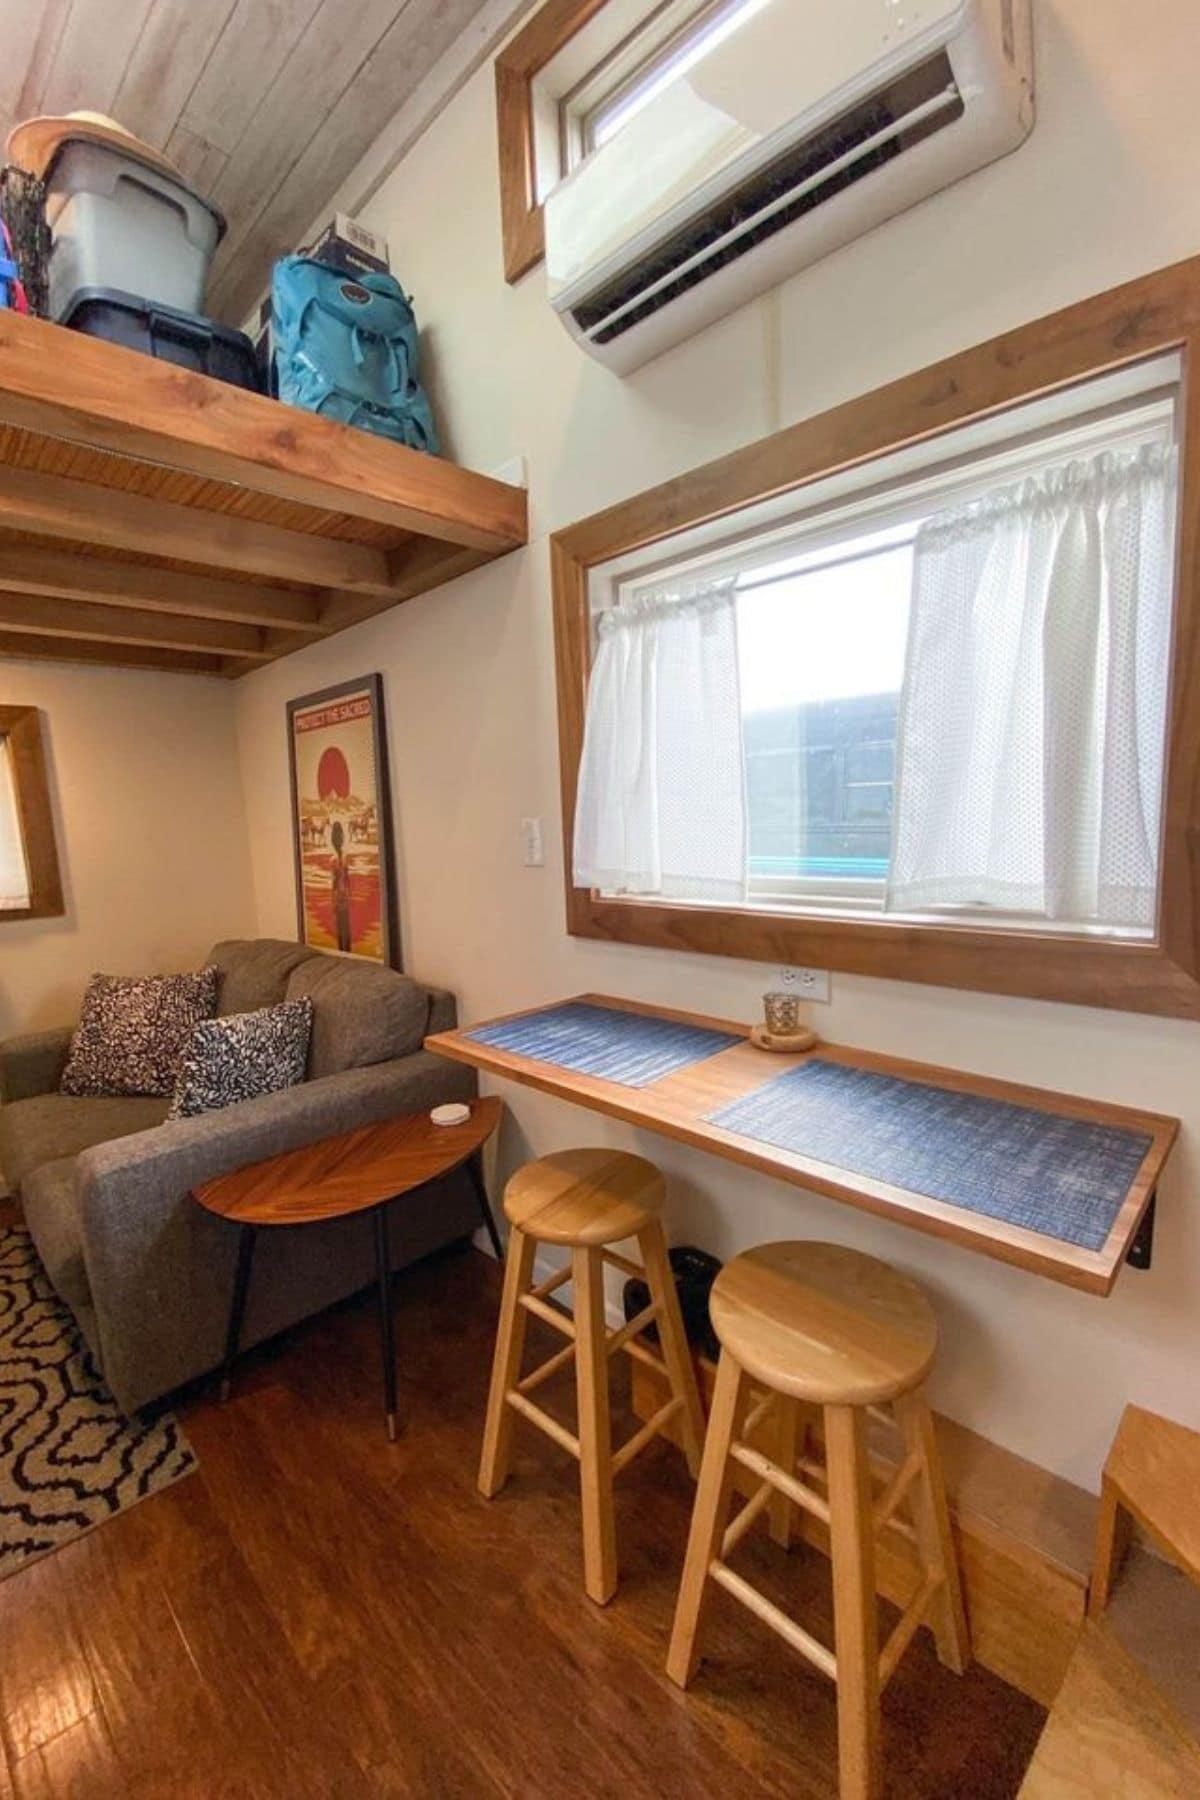 Shelf under window with bar stools